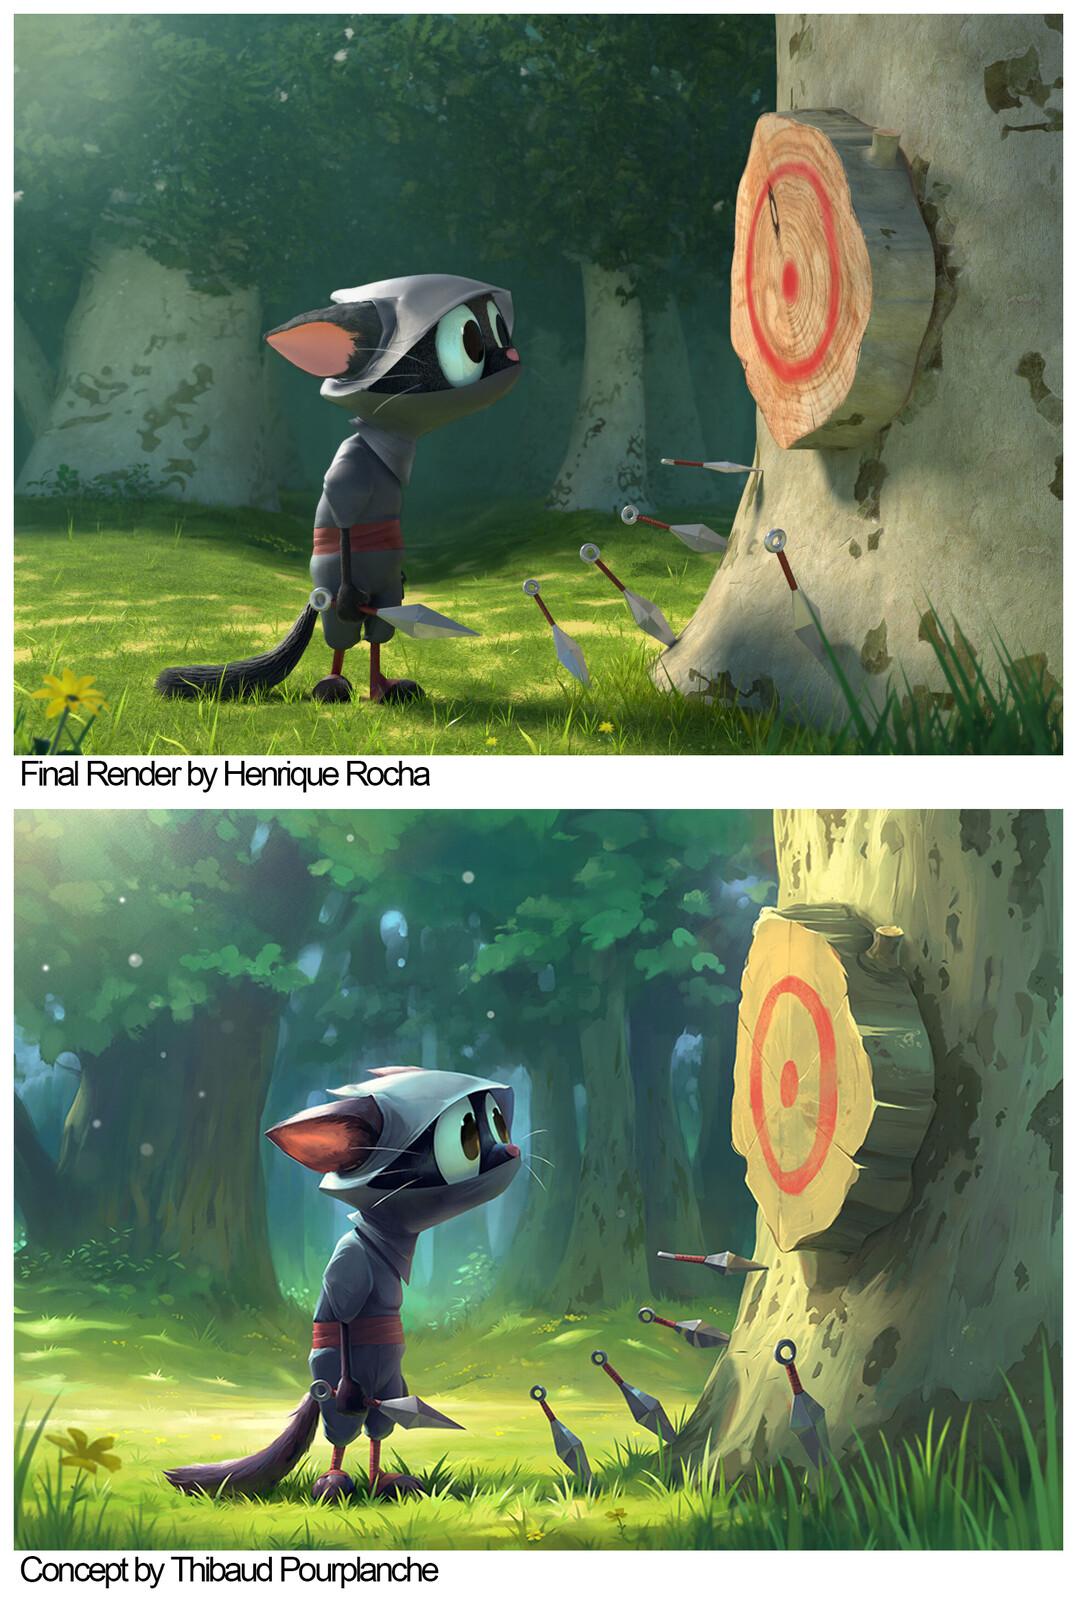 Final render vs Concept